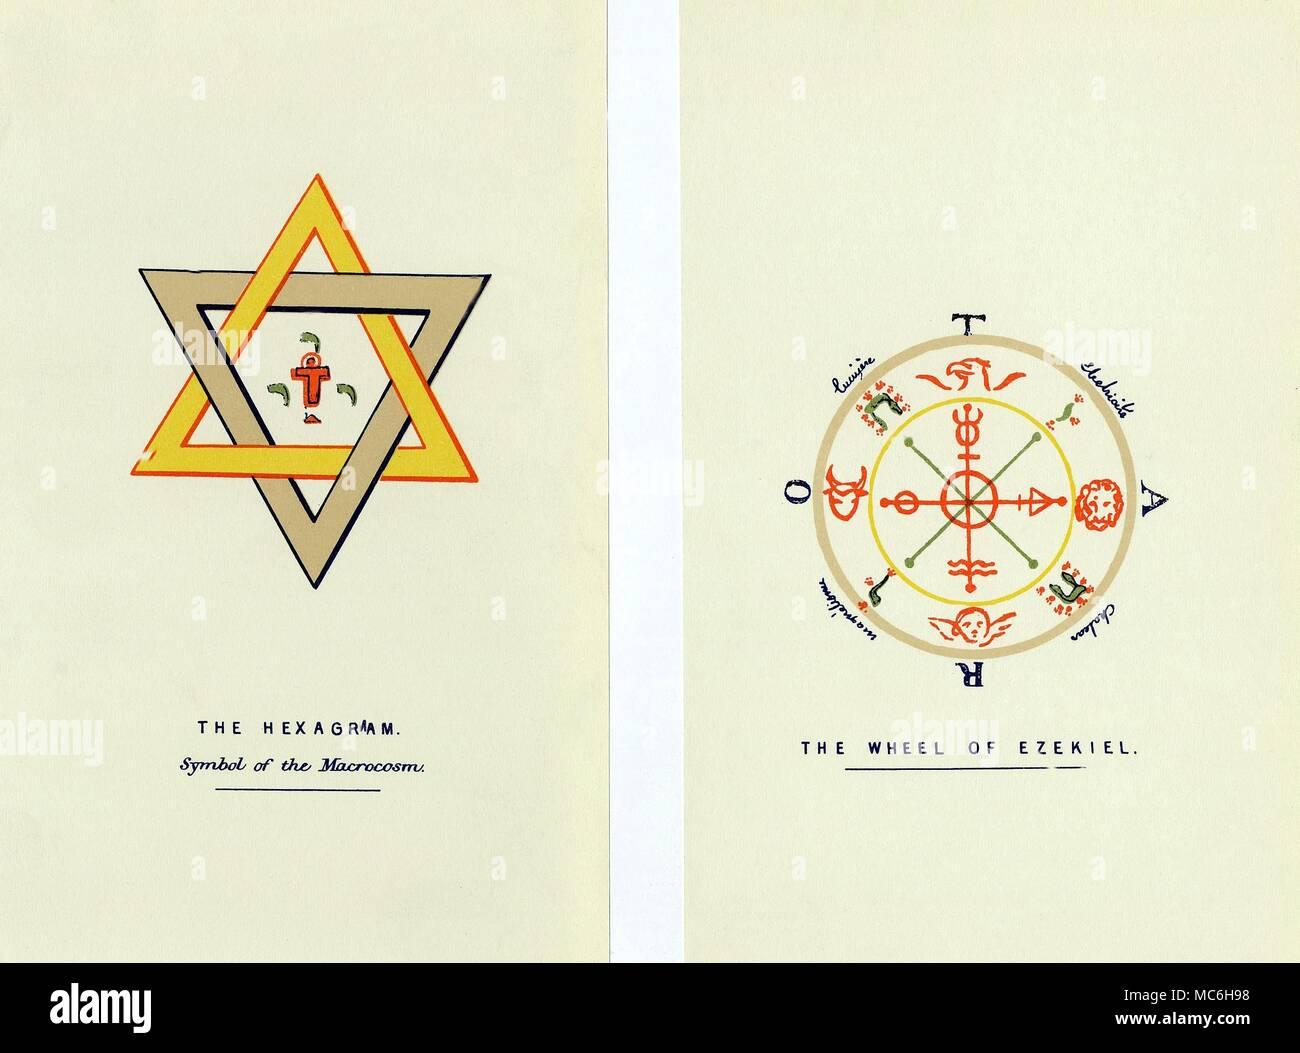 Magic Symbols The Hexagram And The Ezekiel Wheel Magic Symbols